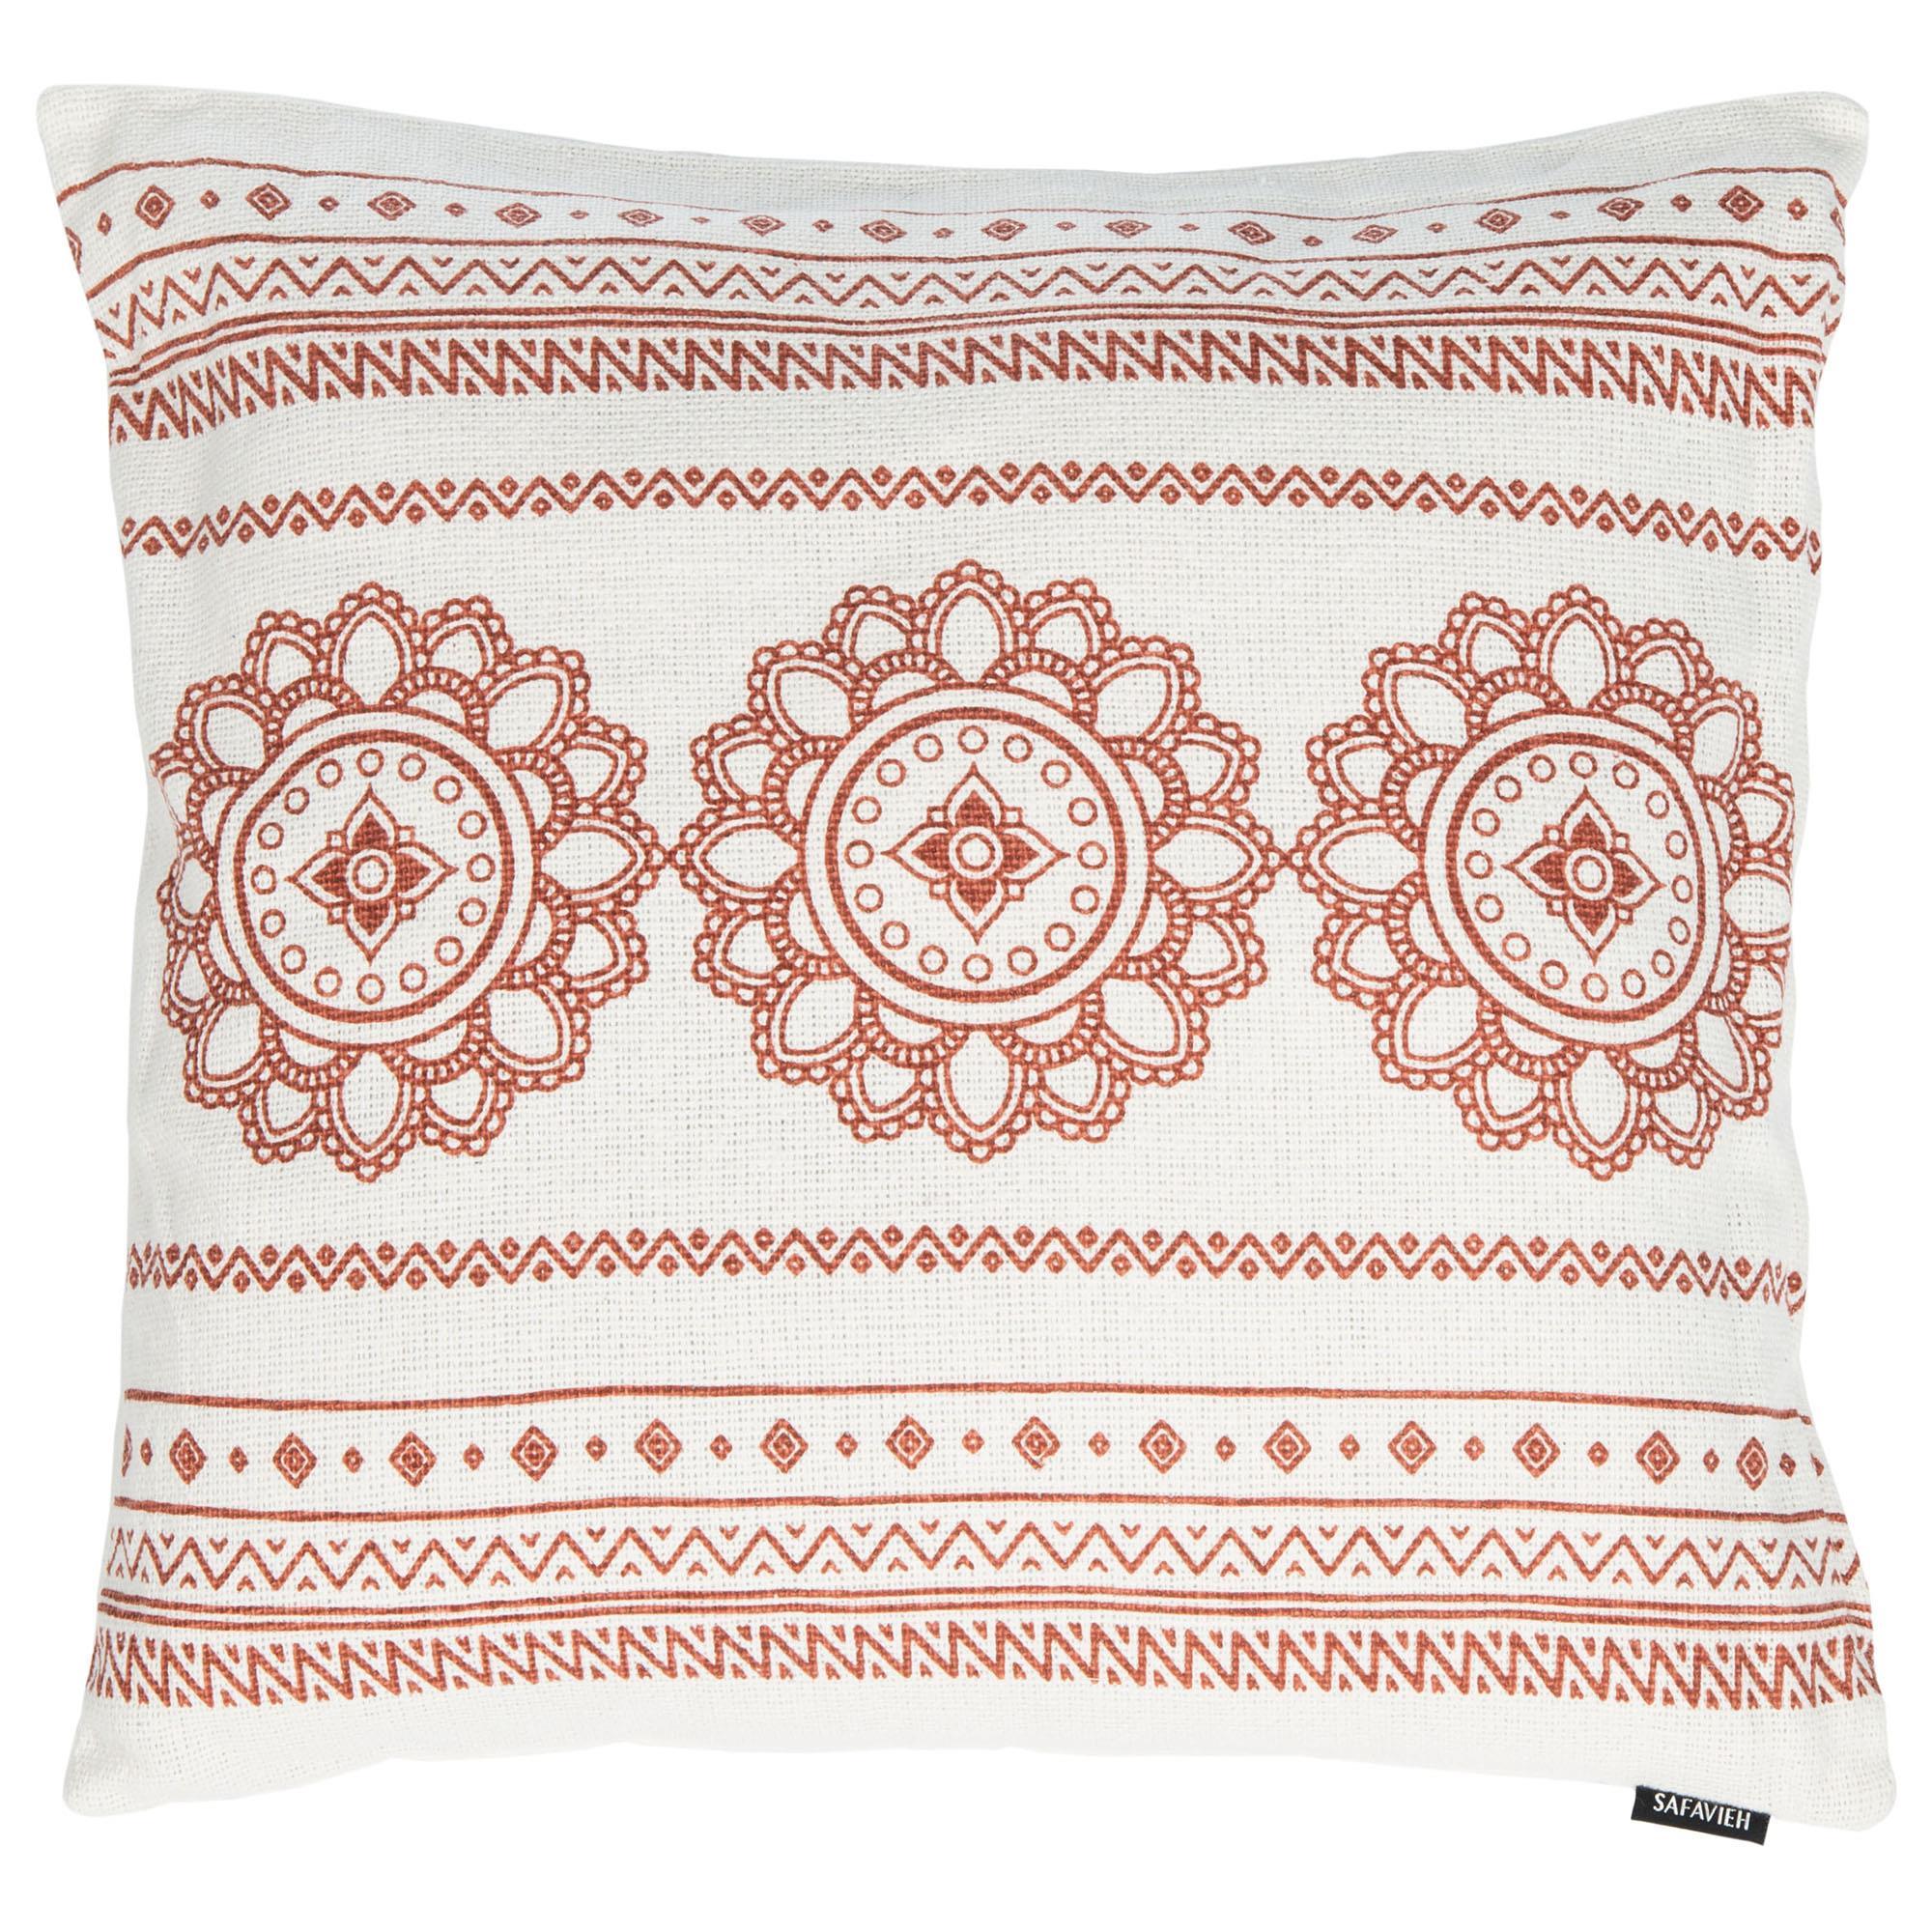 Safavieh Zarra 20 Pillow In Off White And Red Nebraska Furniture Mart